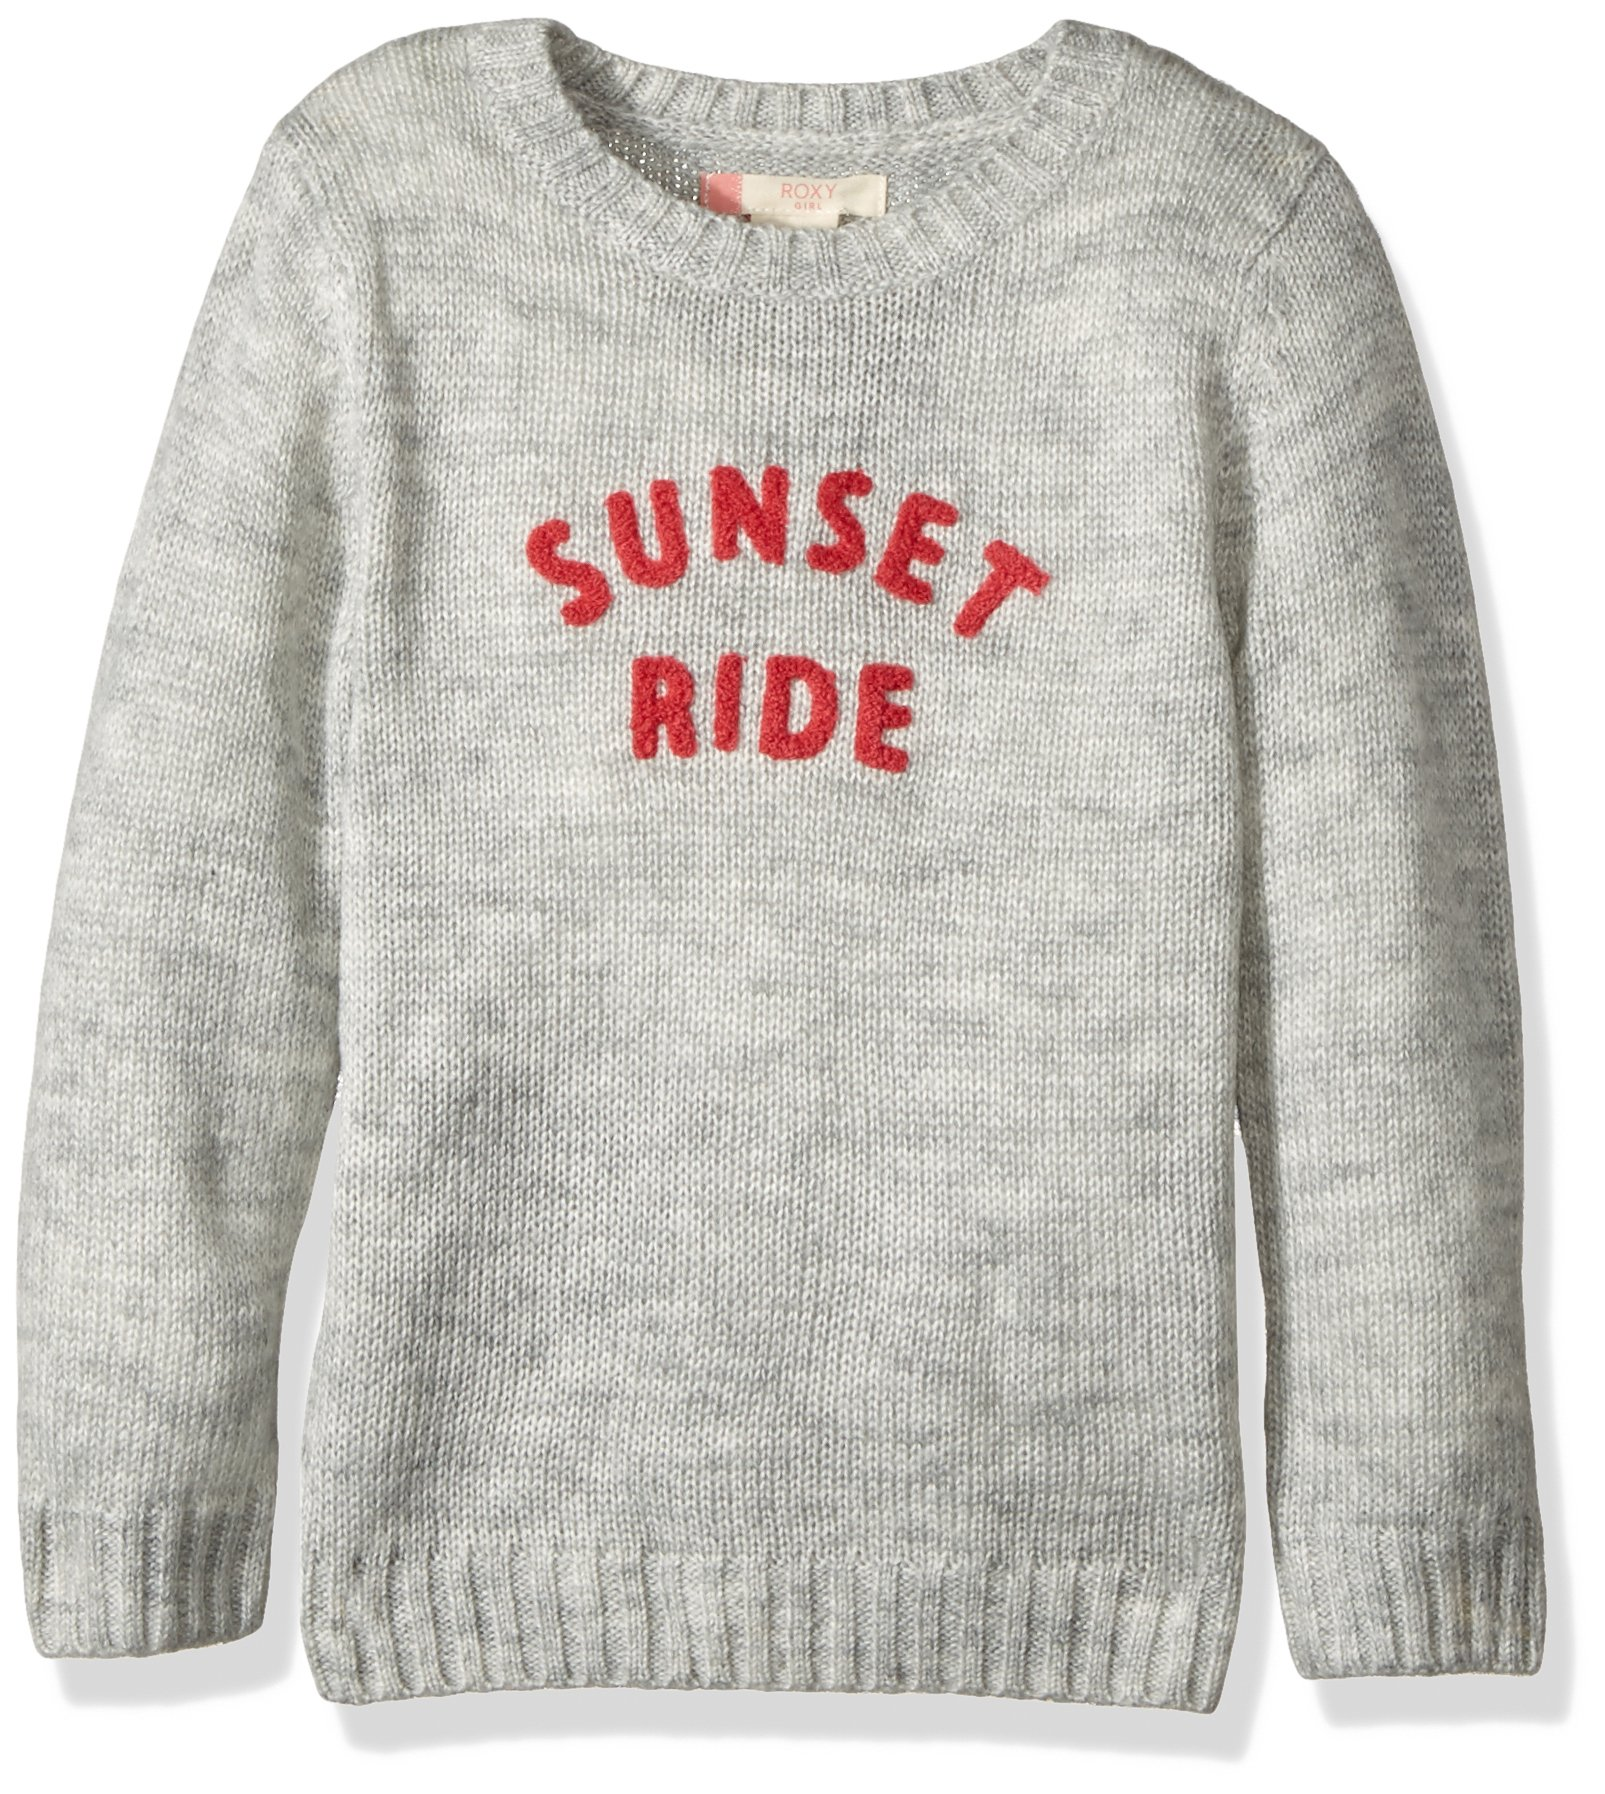 Roxy Girls' Little Daisy Tales Sweater, Heritage Heather 7 by Roxy (Image #1)